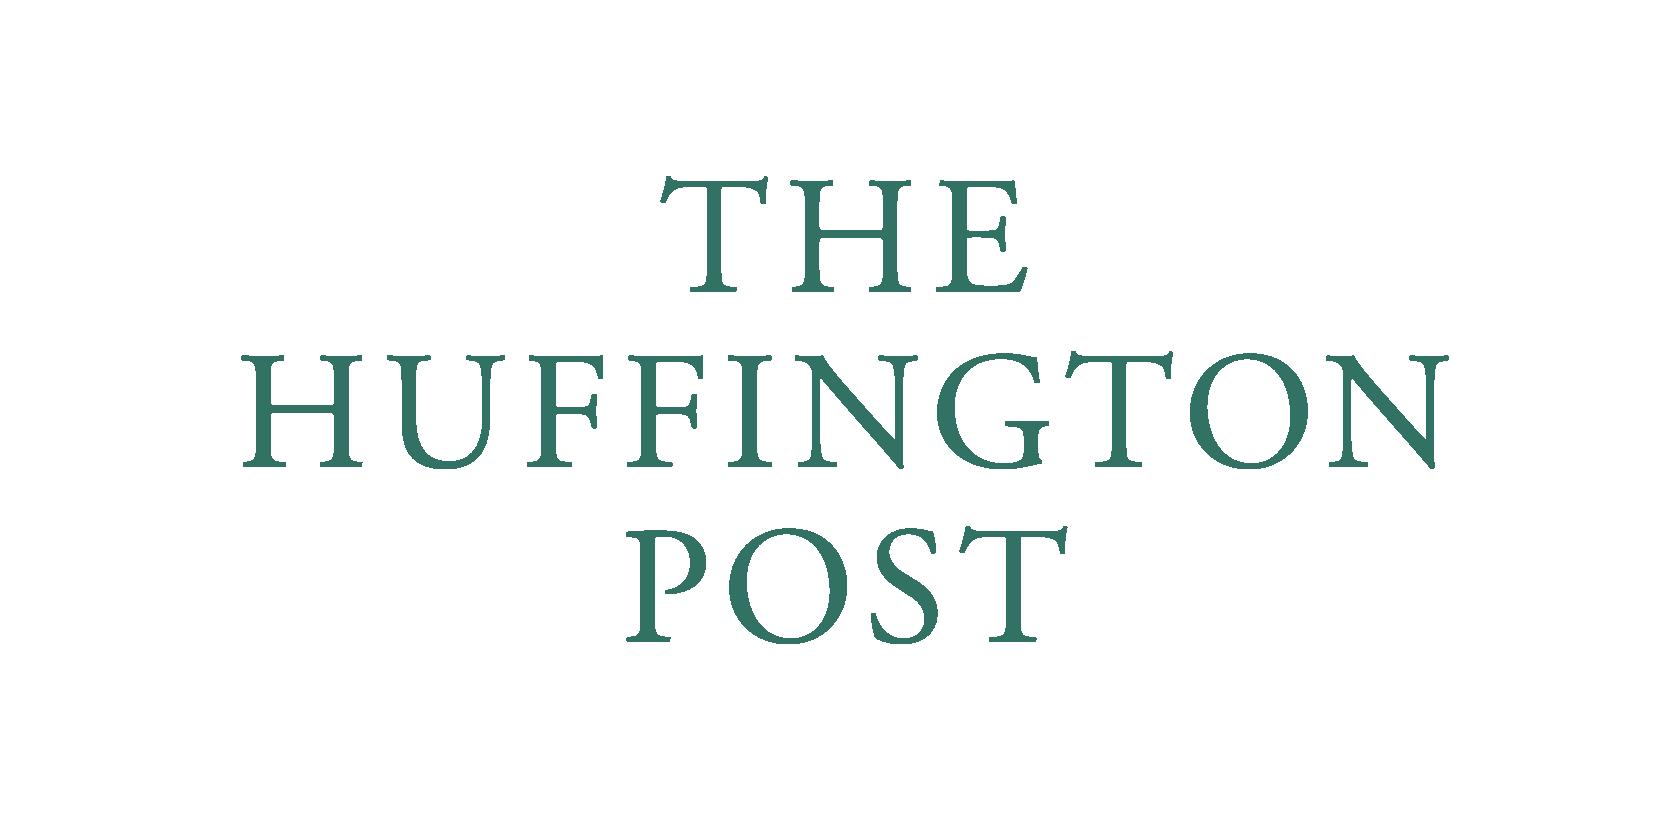 Huffington-Post-Logo-002-1.png